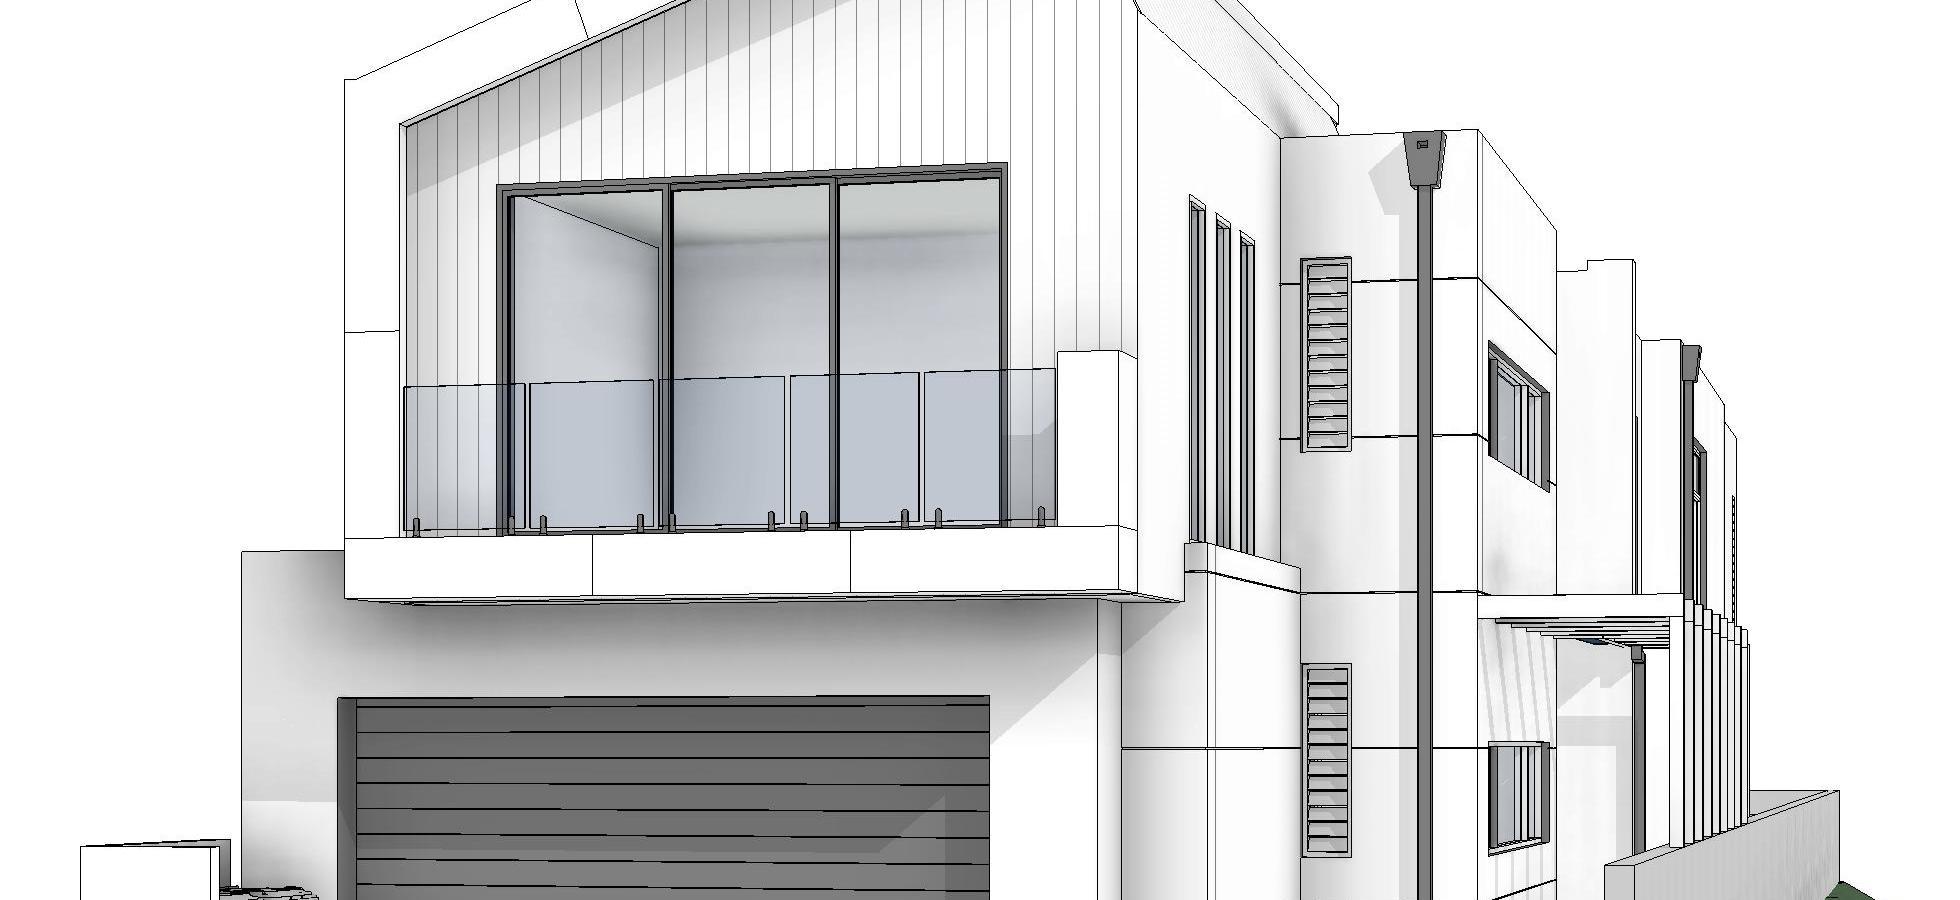 version-01 custom house design 001